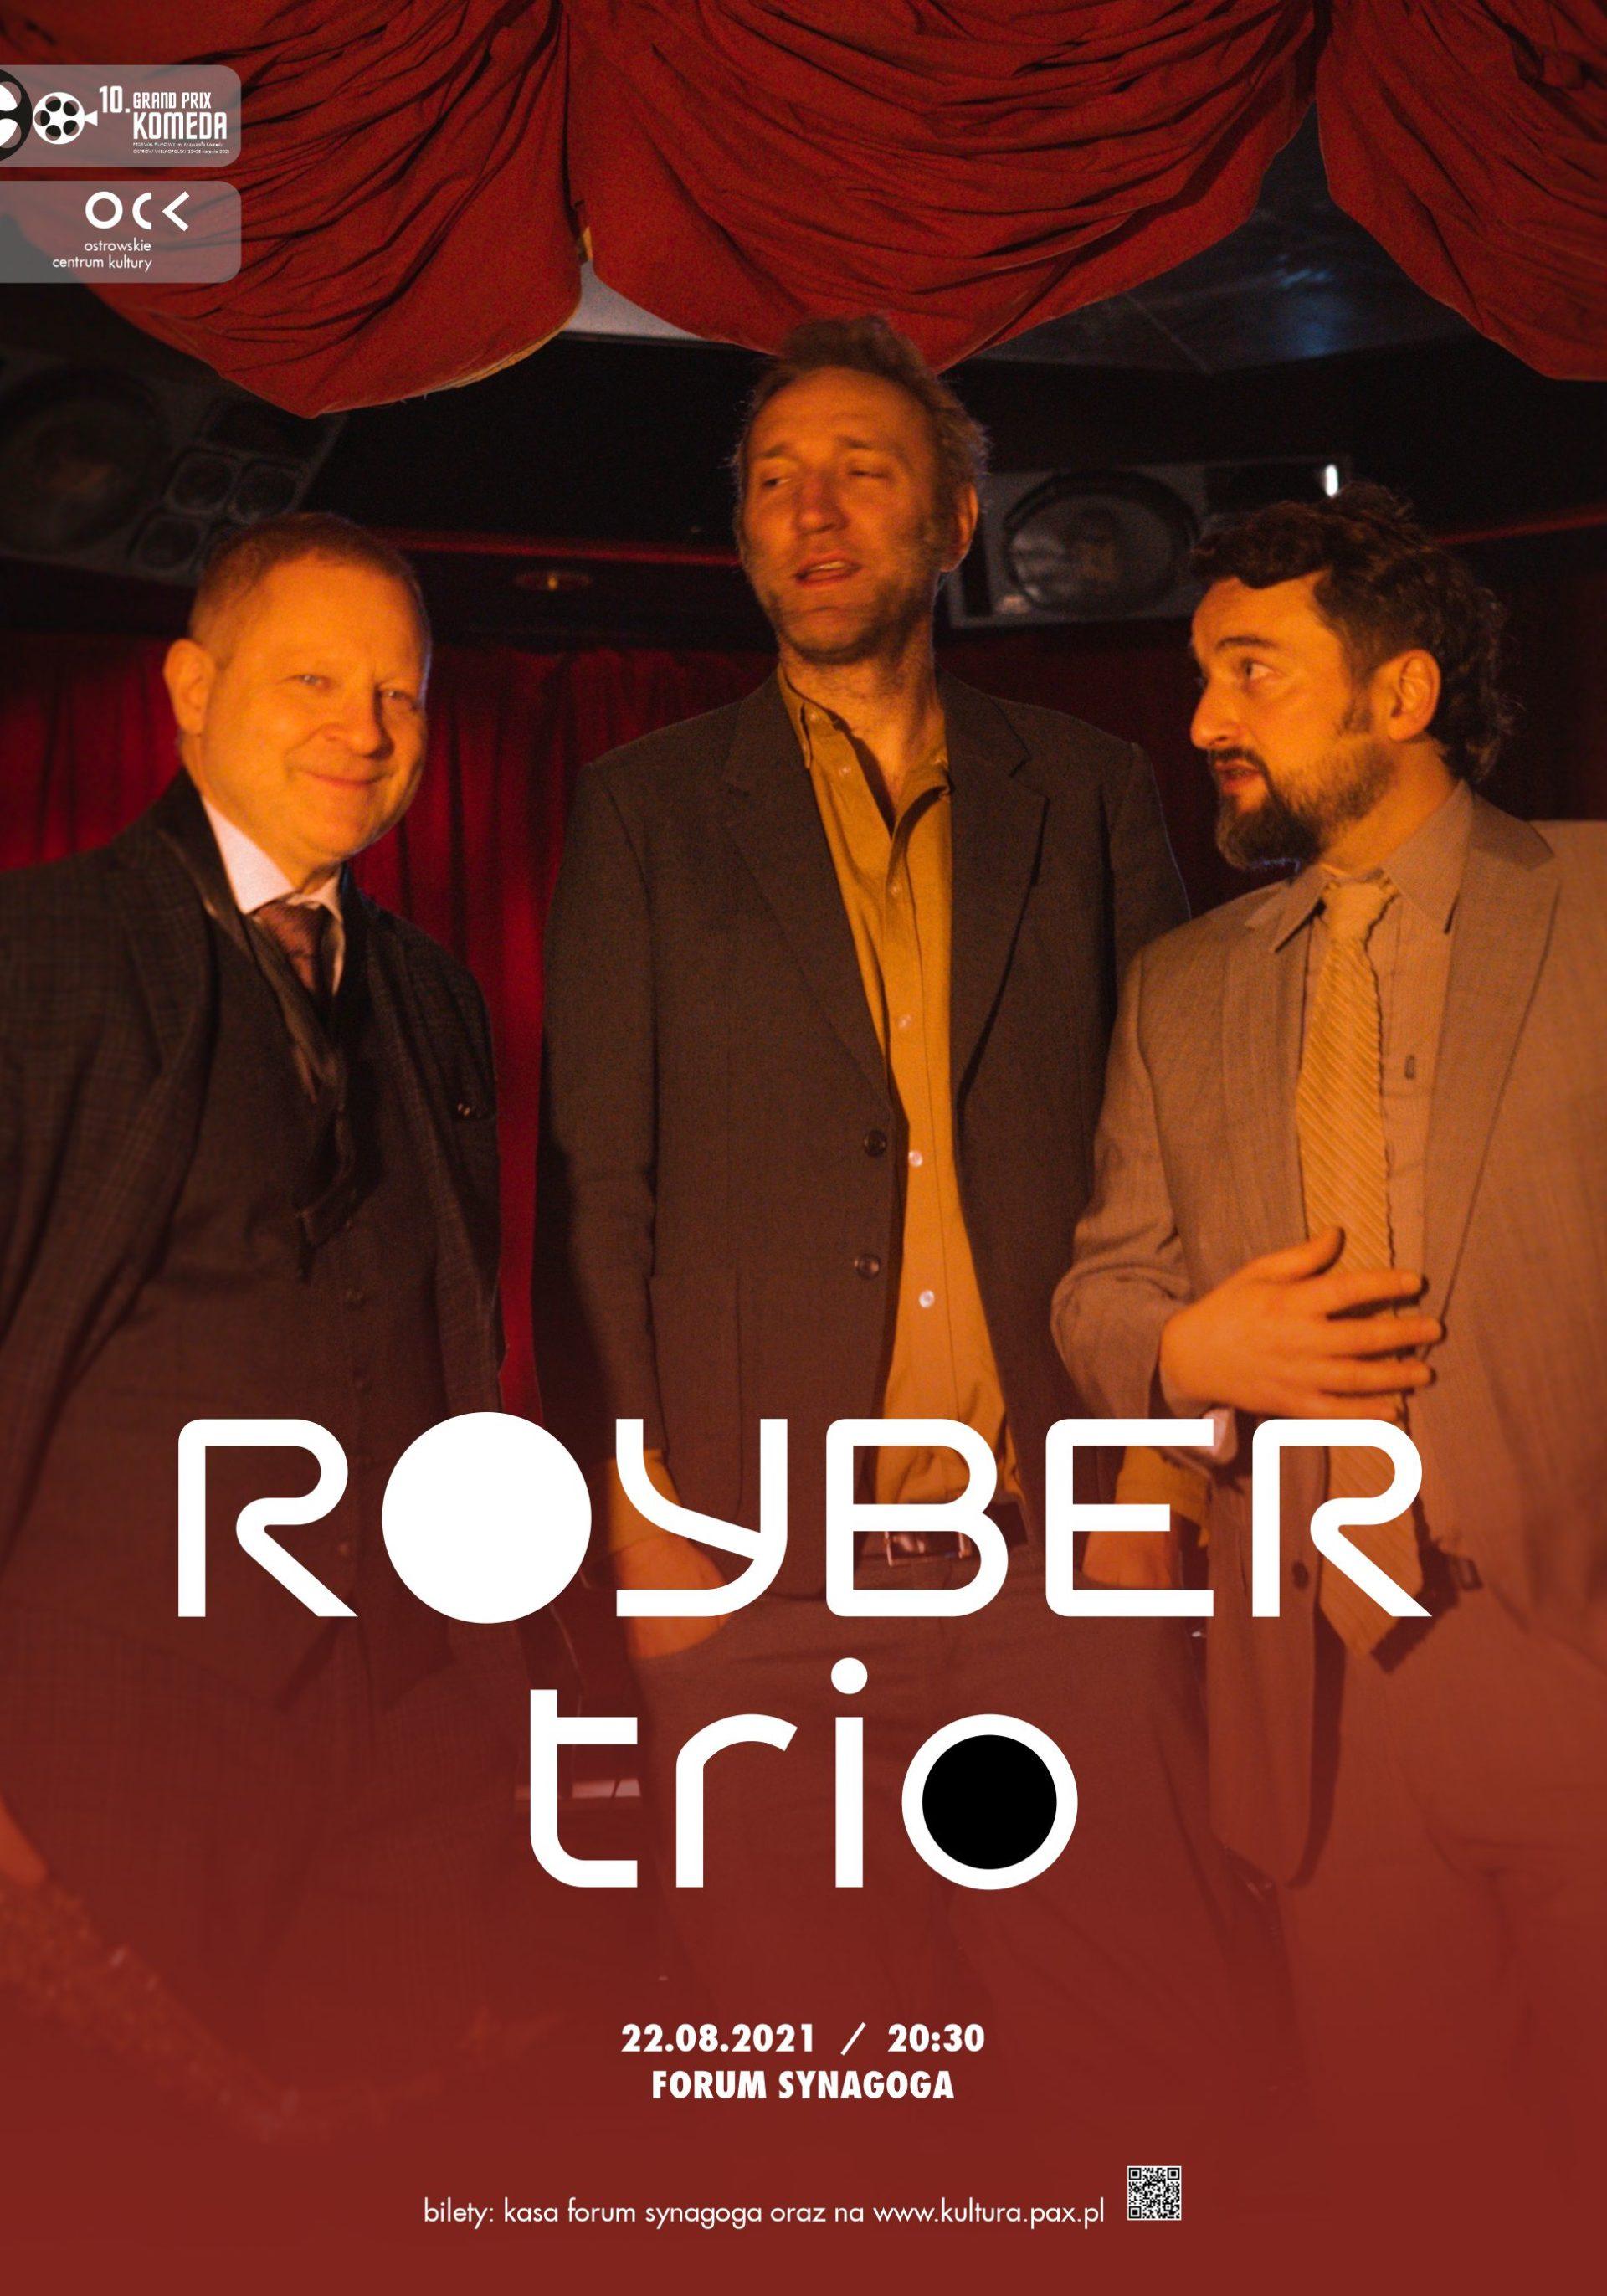 10. Grand Prix Komeda | Royber Trio